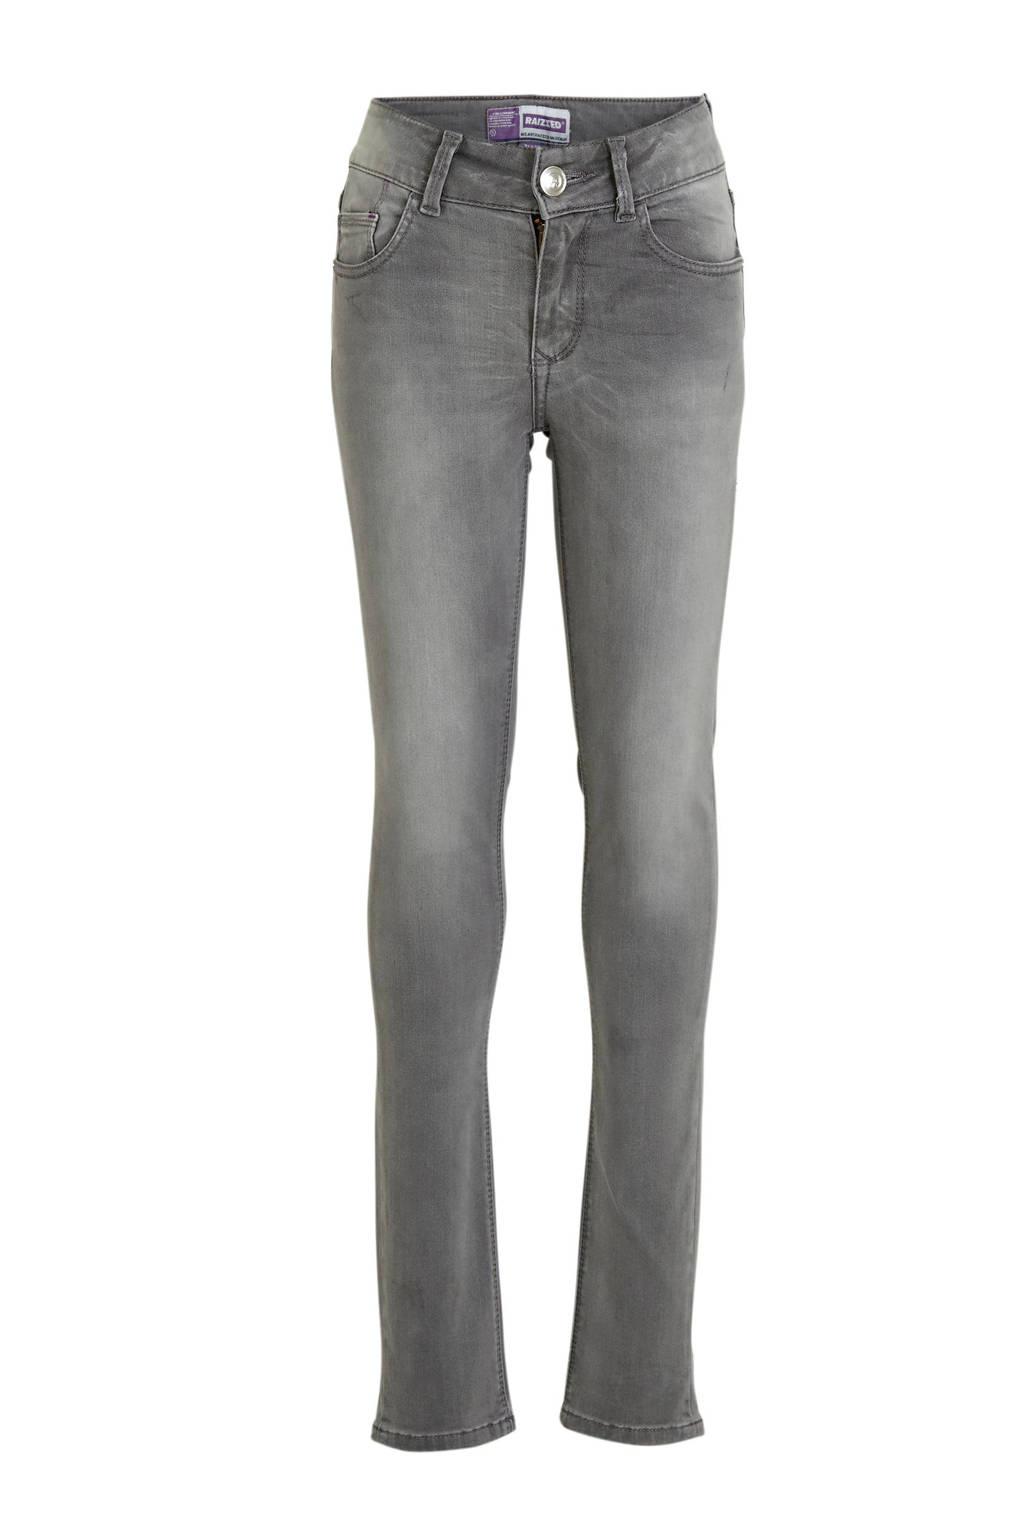 Raizzed high waist super skinny jeans Chelsea grijs stonewashed, Grijs stonewashed